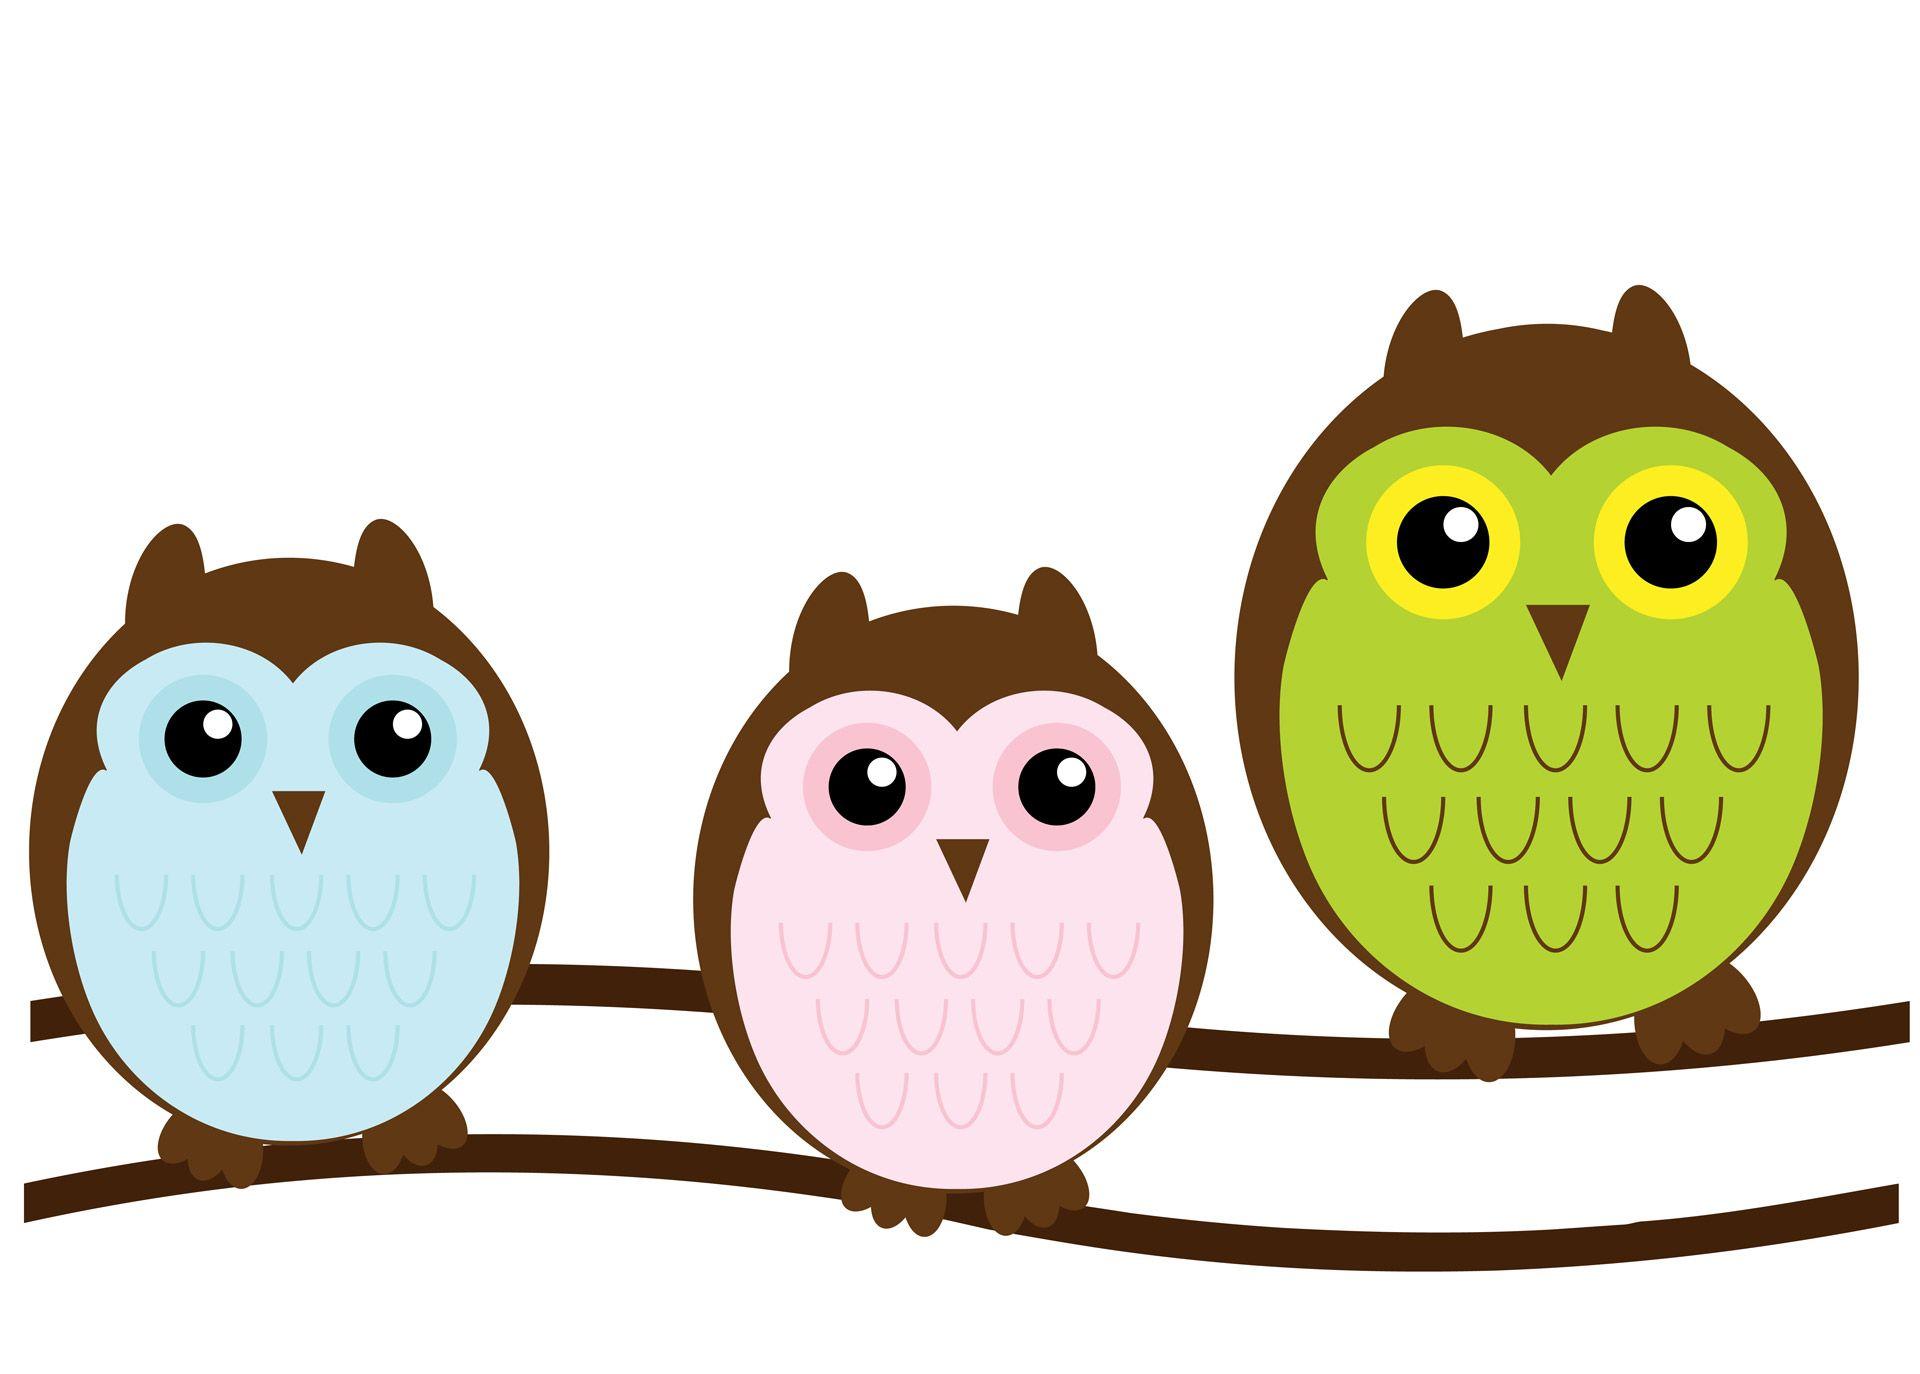 pin by ewa mach on sowa pinterest owl family owl and clip art rh pinterest com Family Clip Art Owl Love Family Clip Art Owl Love